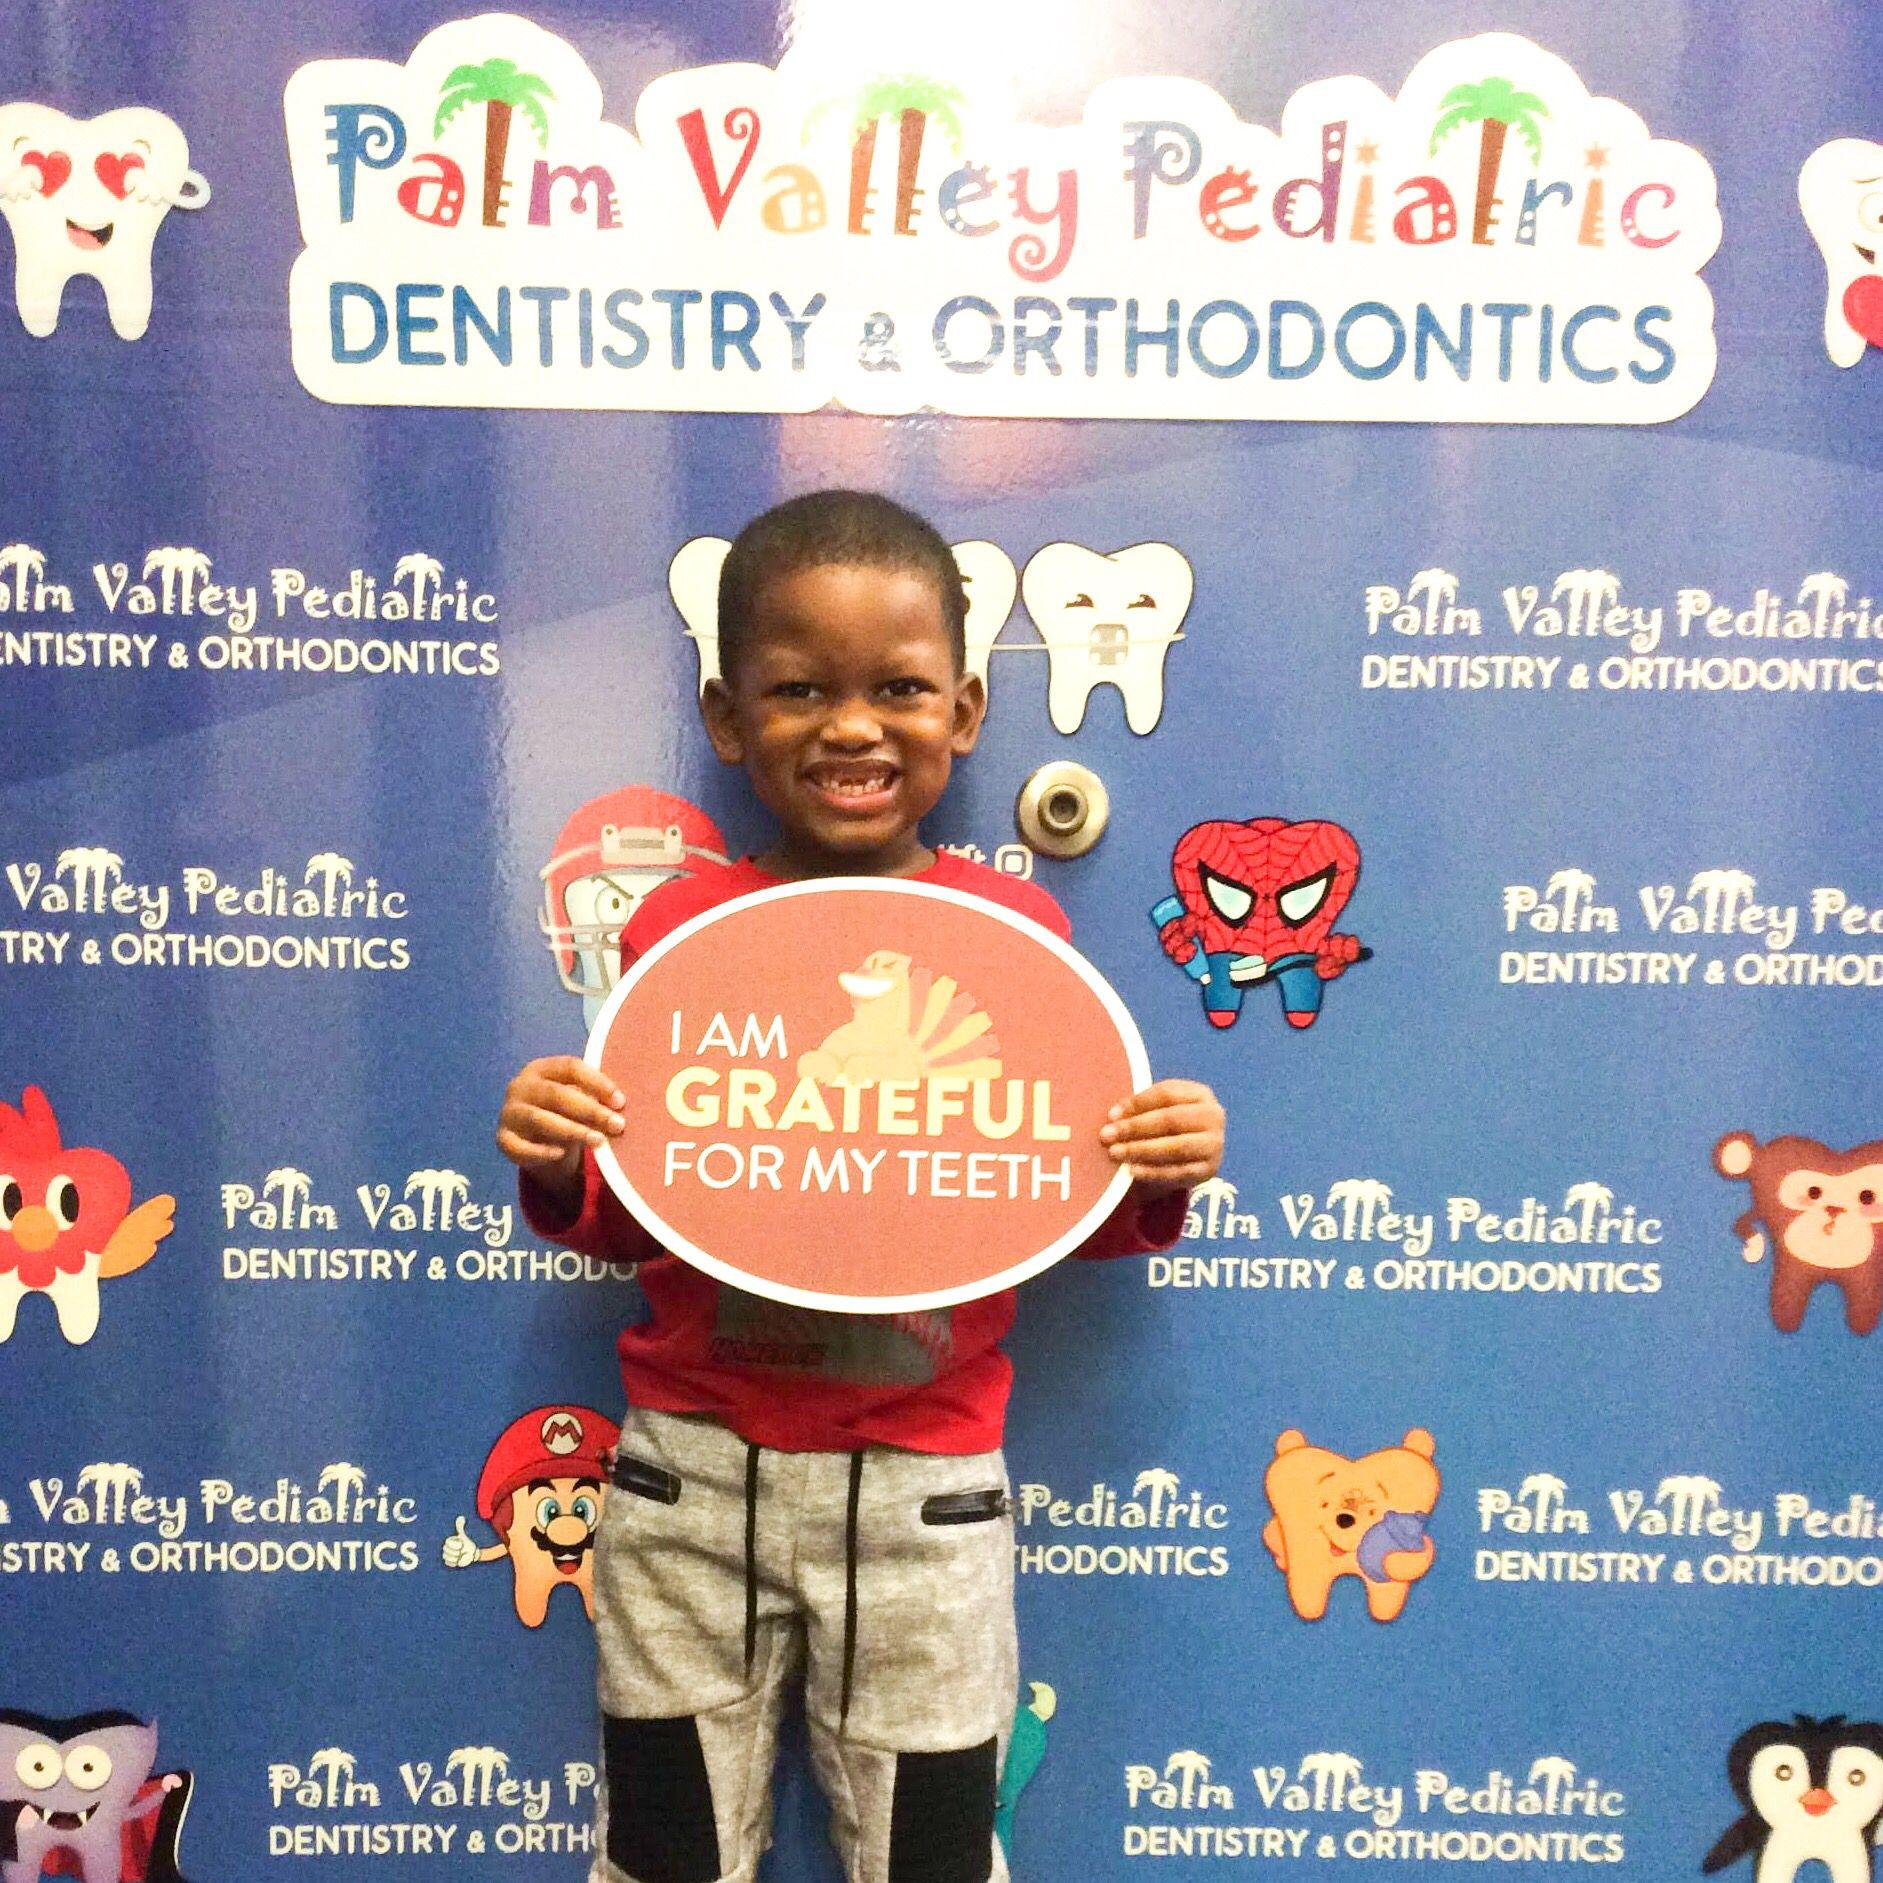 Palm Valley Pediatric Dentistry & Orthodontics Pediatric